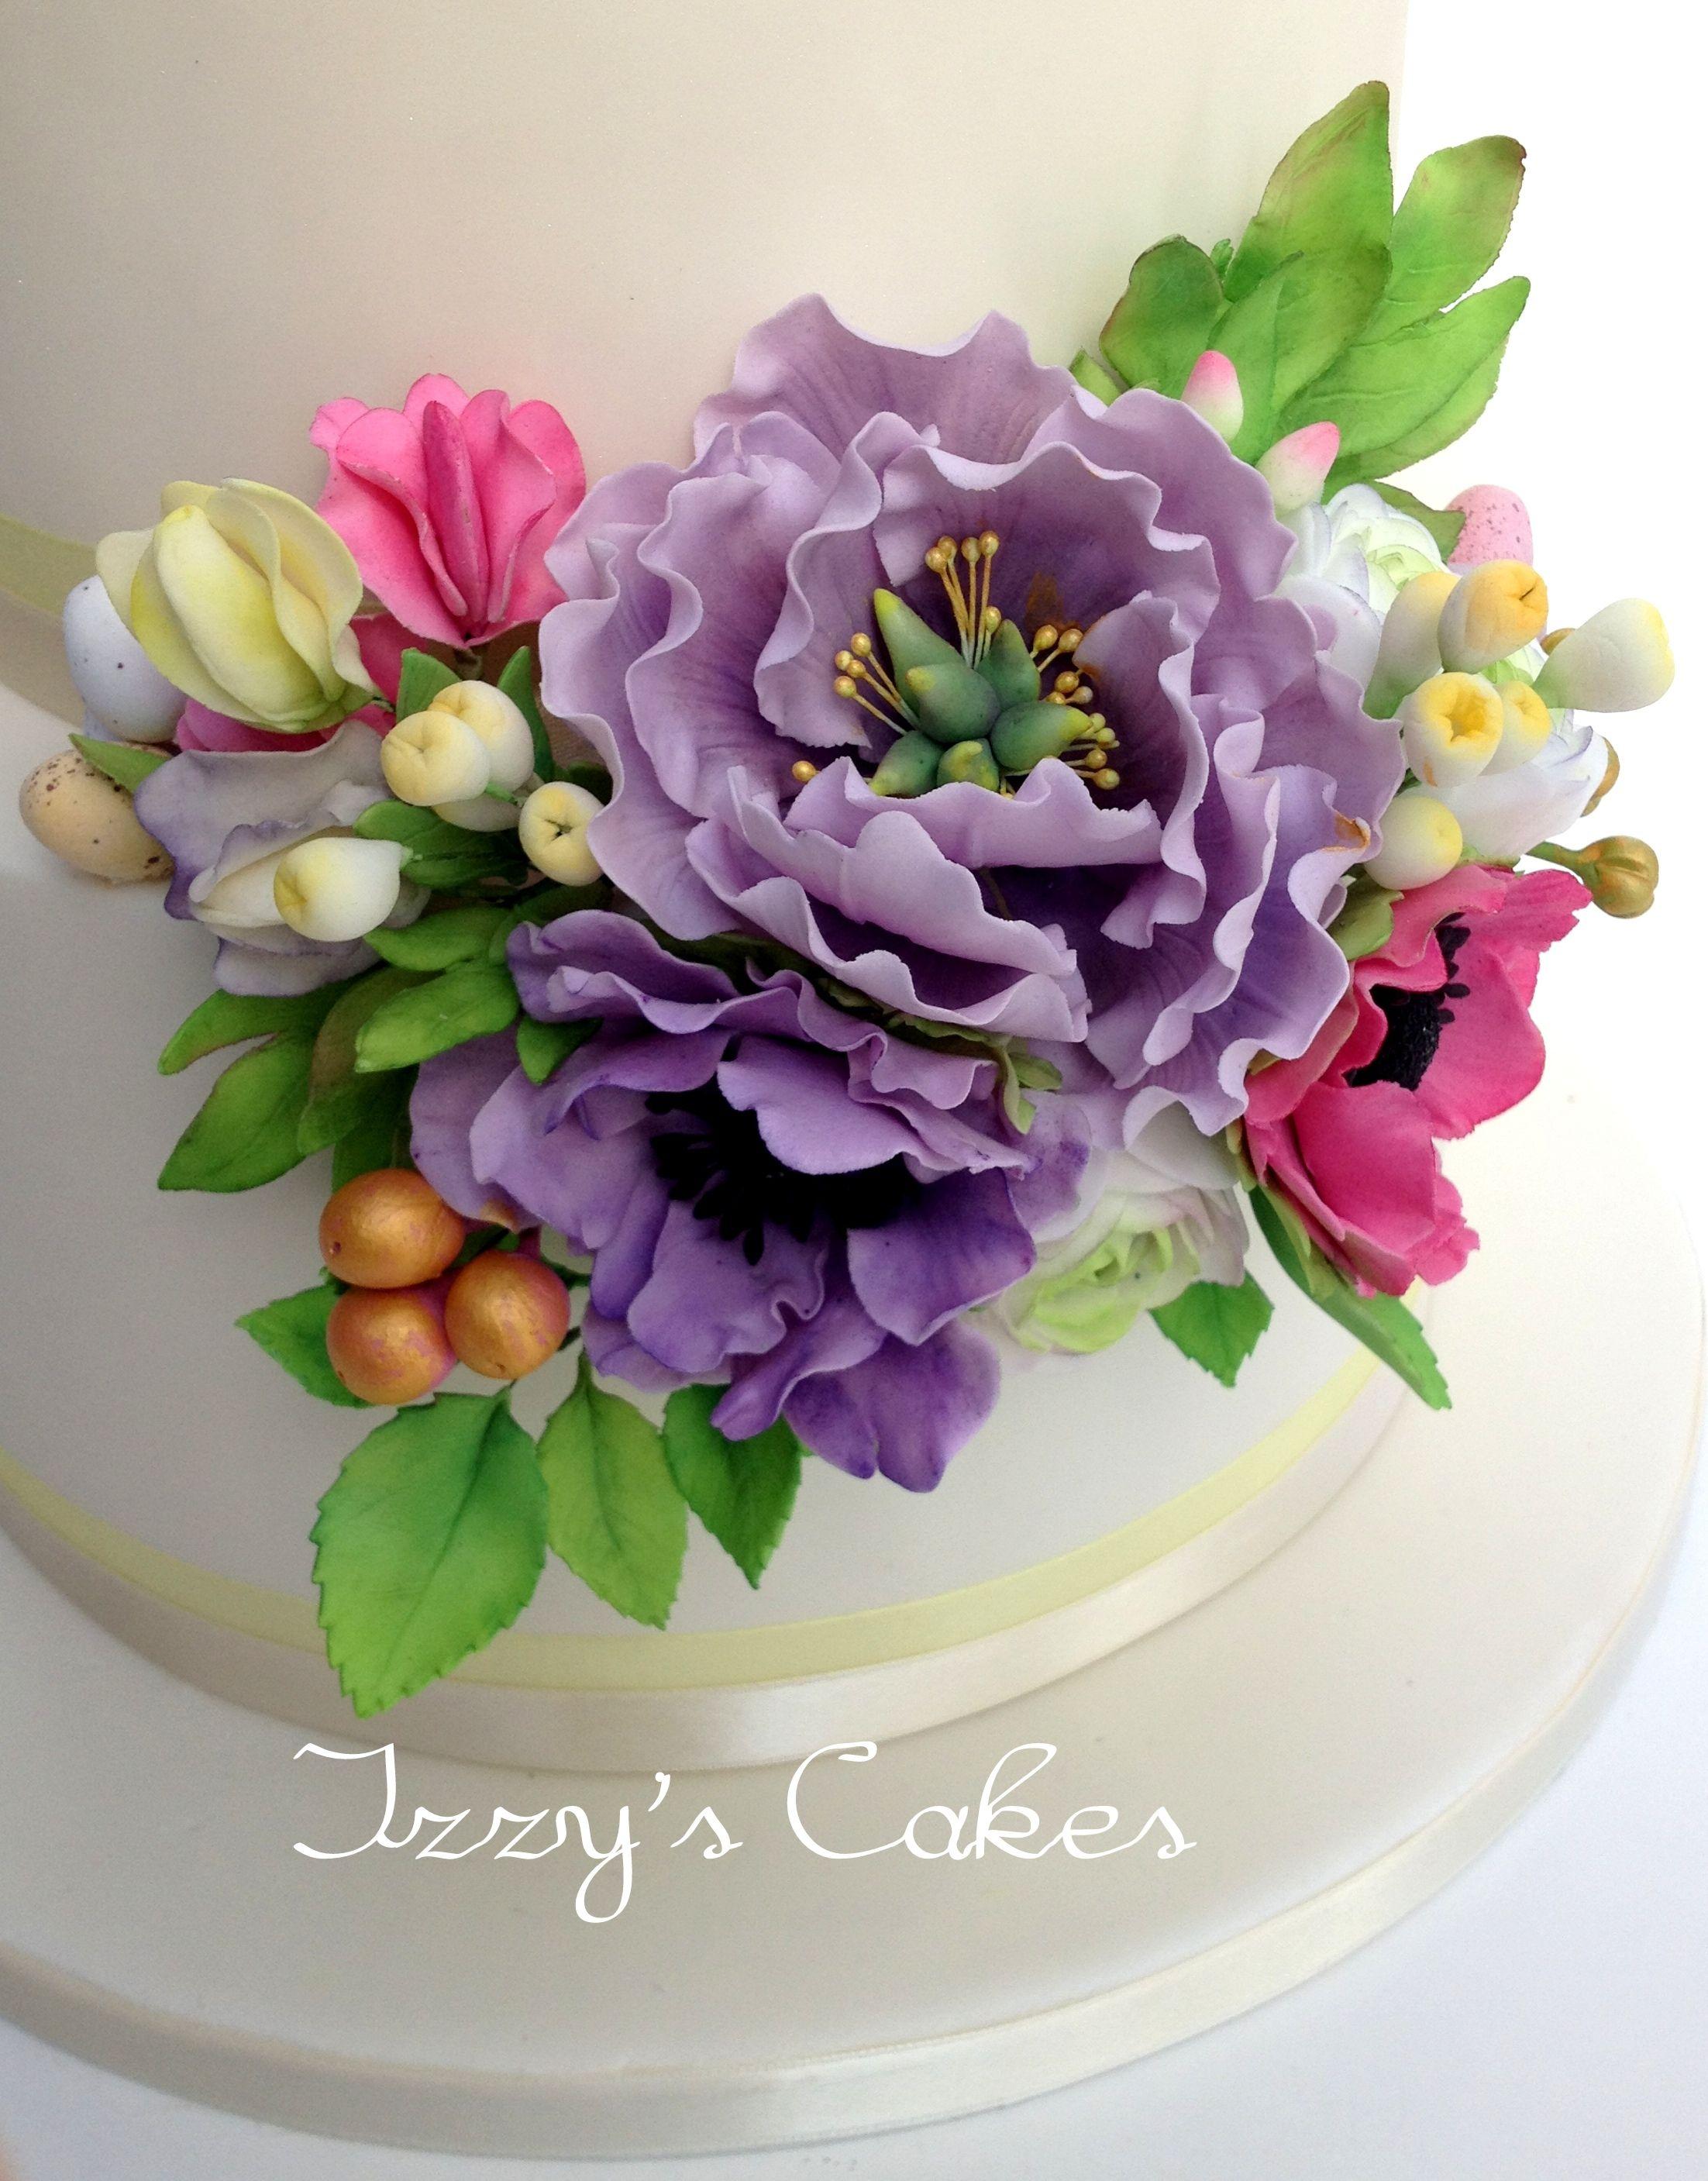 Edible sugar flowers (peony, anemone, sweet pea) to match ...